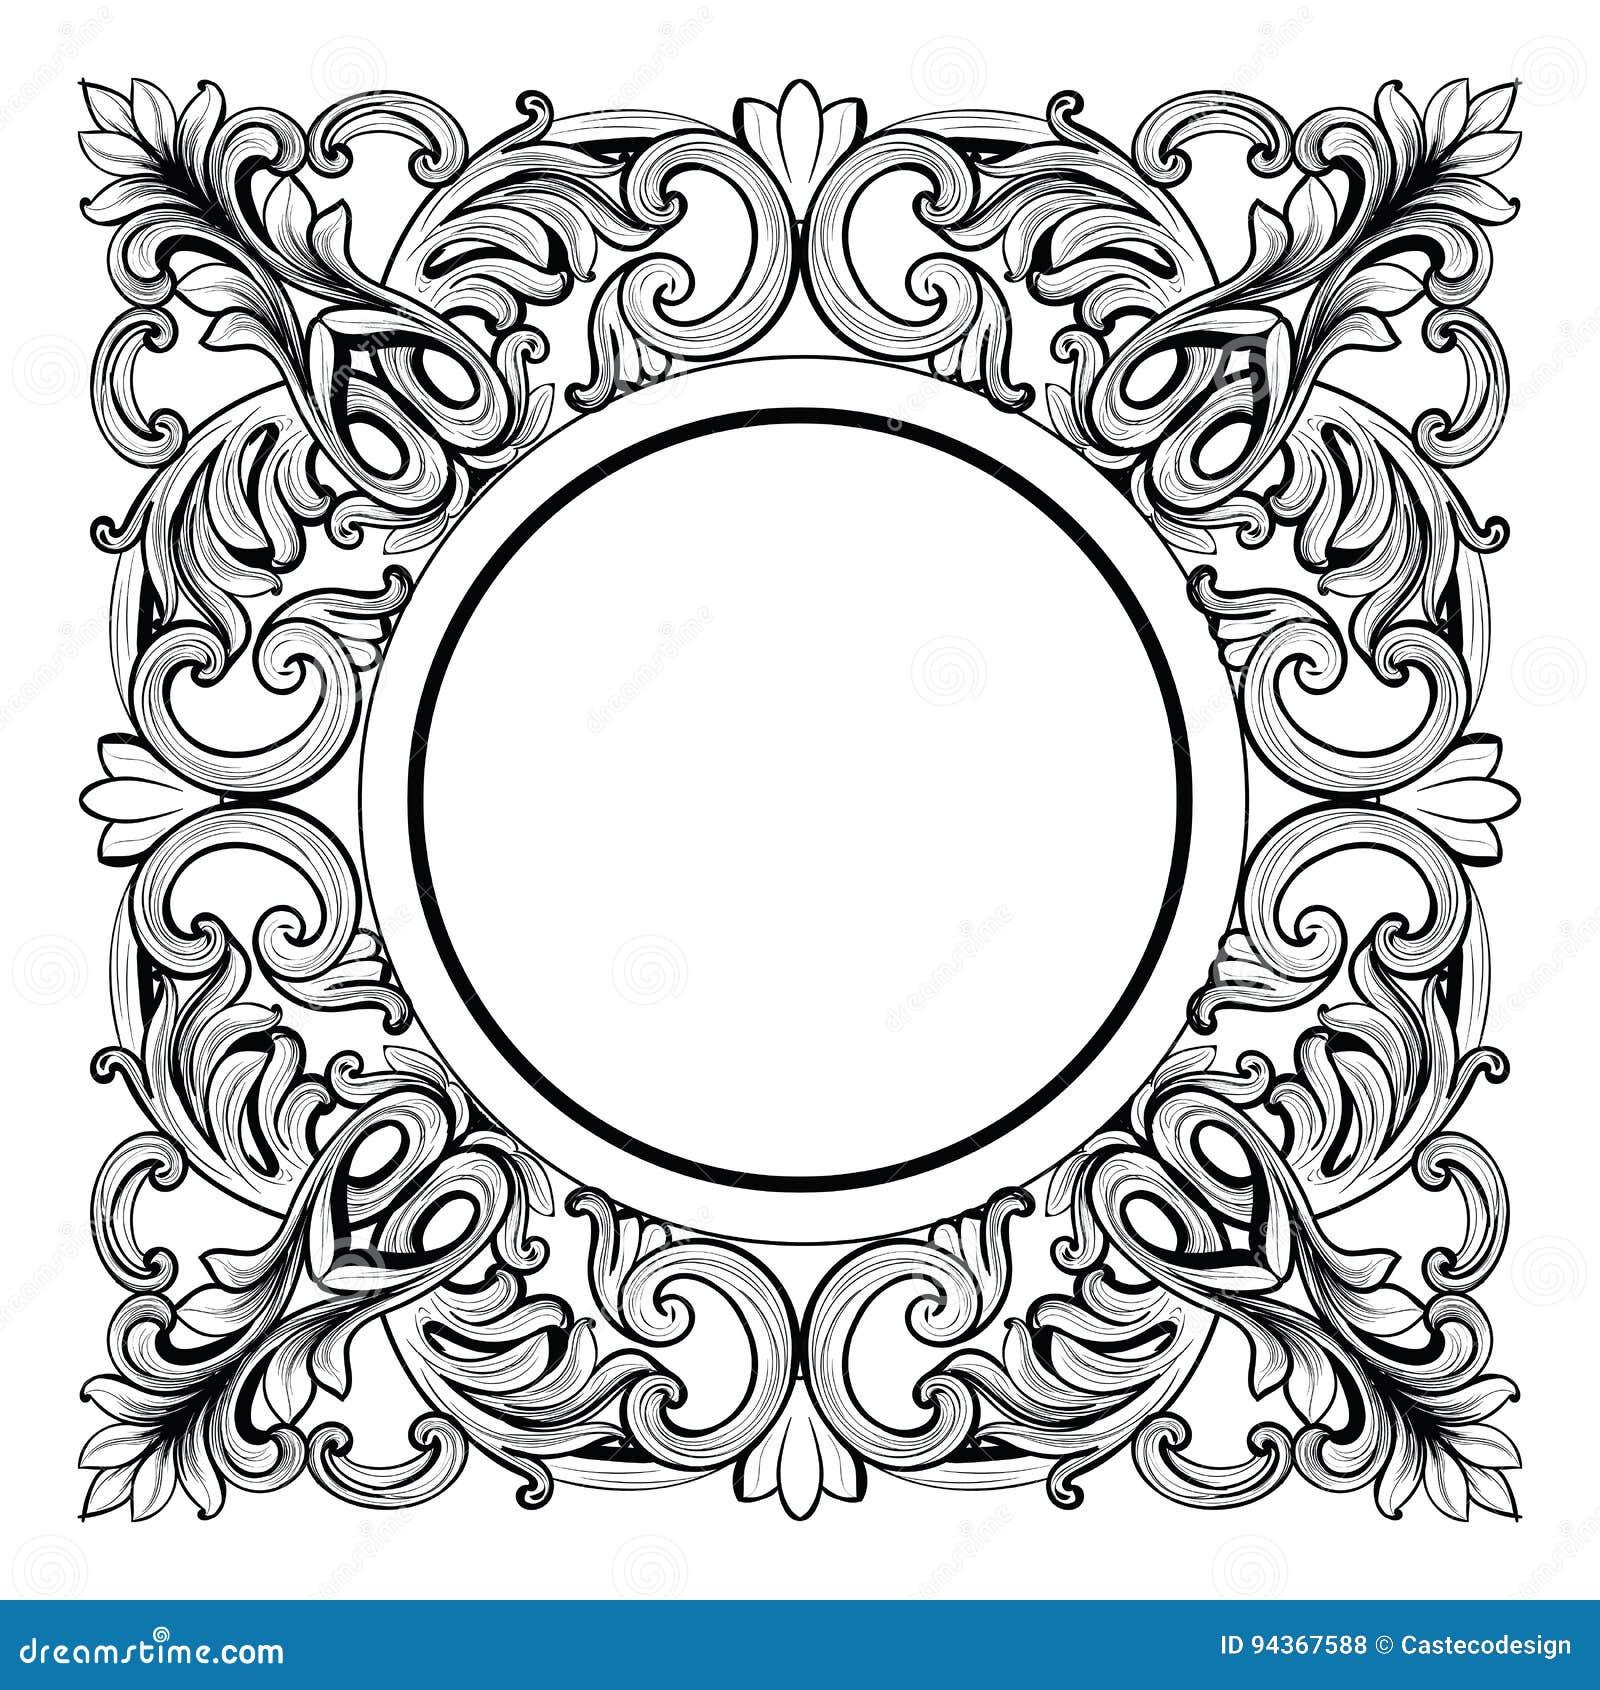 Wilko baroque mirror silver 87x62cm -  Vintage Imperial Baroque Mirror Round Frame Vector French Luxury